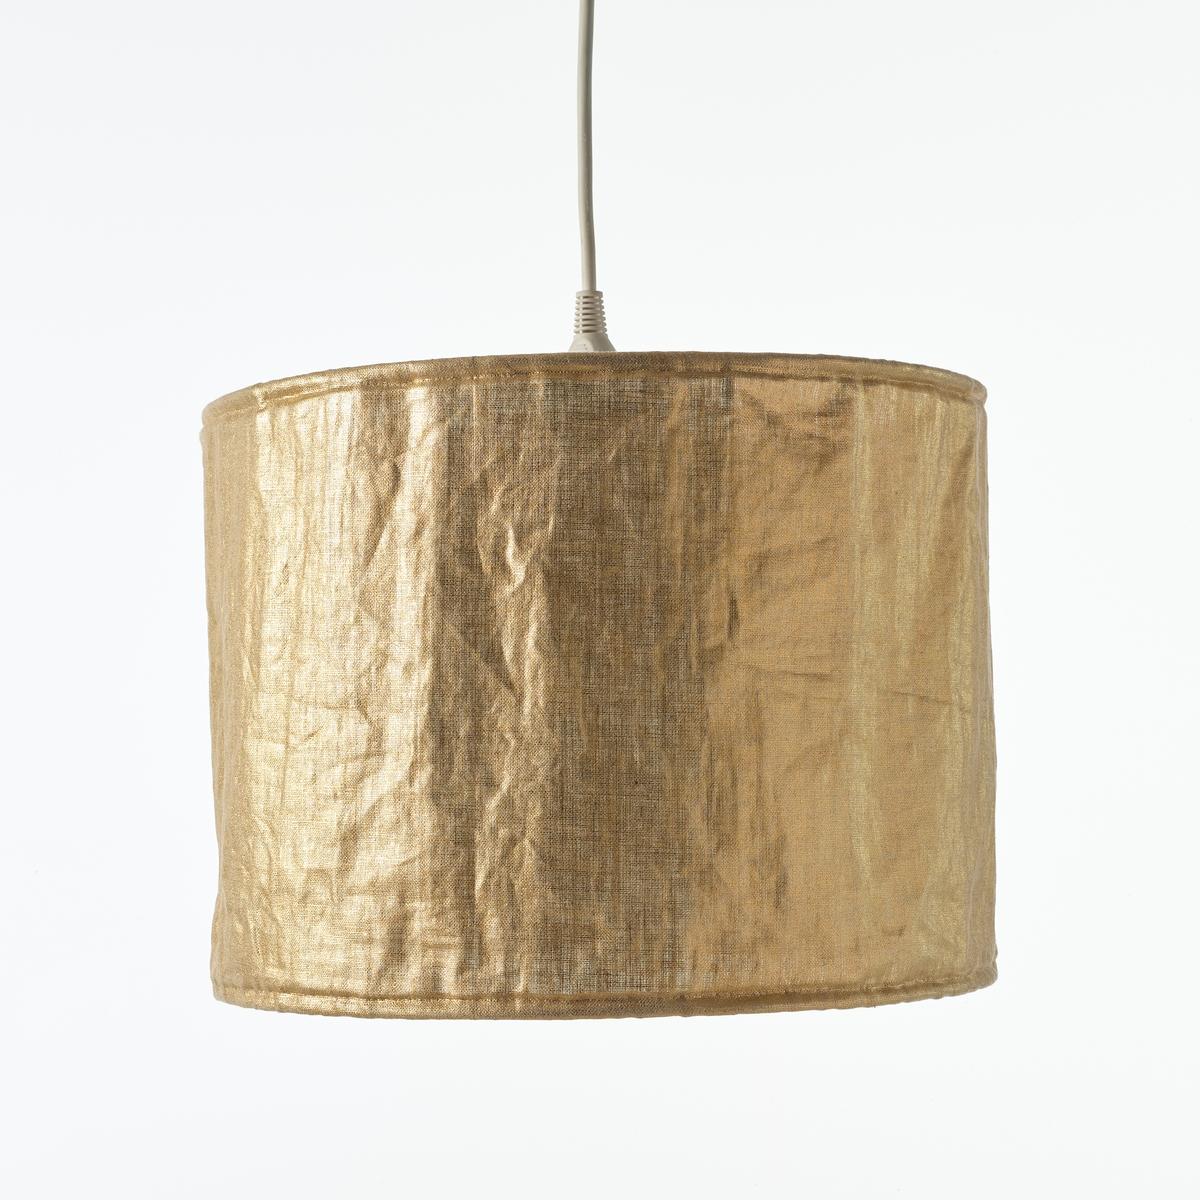 цена Люстра La Redoute Золотистого цвета из льна Goldyni диаметр 40 см золотистый онлайн в 2017 году